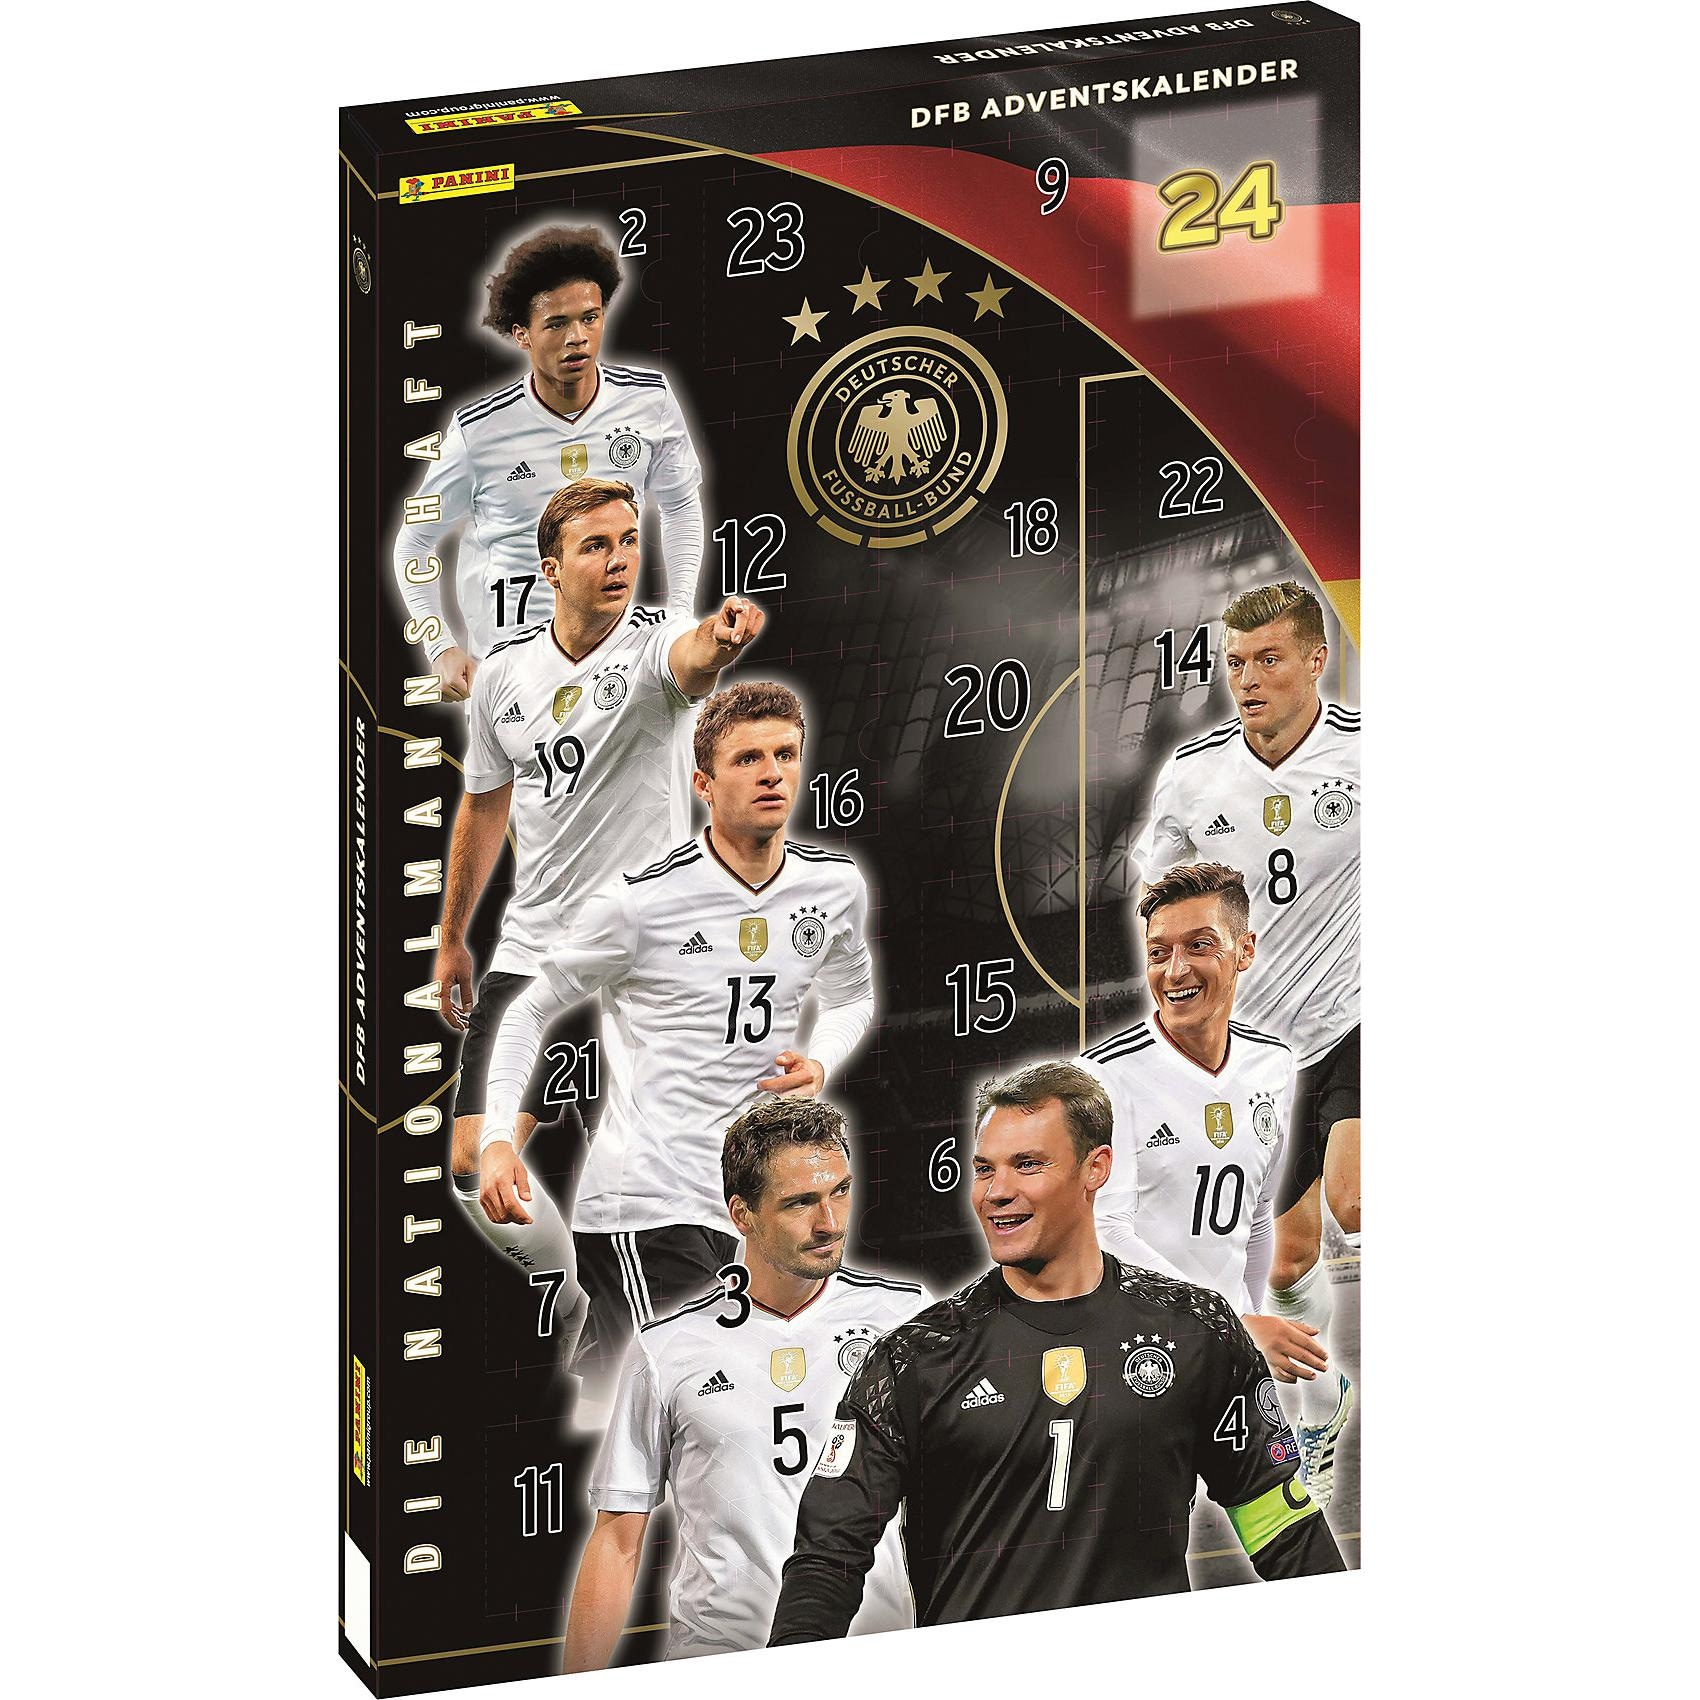 Panini Verlag Adventskalender DFB Nationalmannschaft